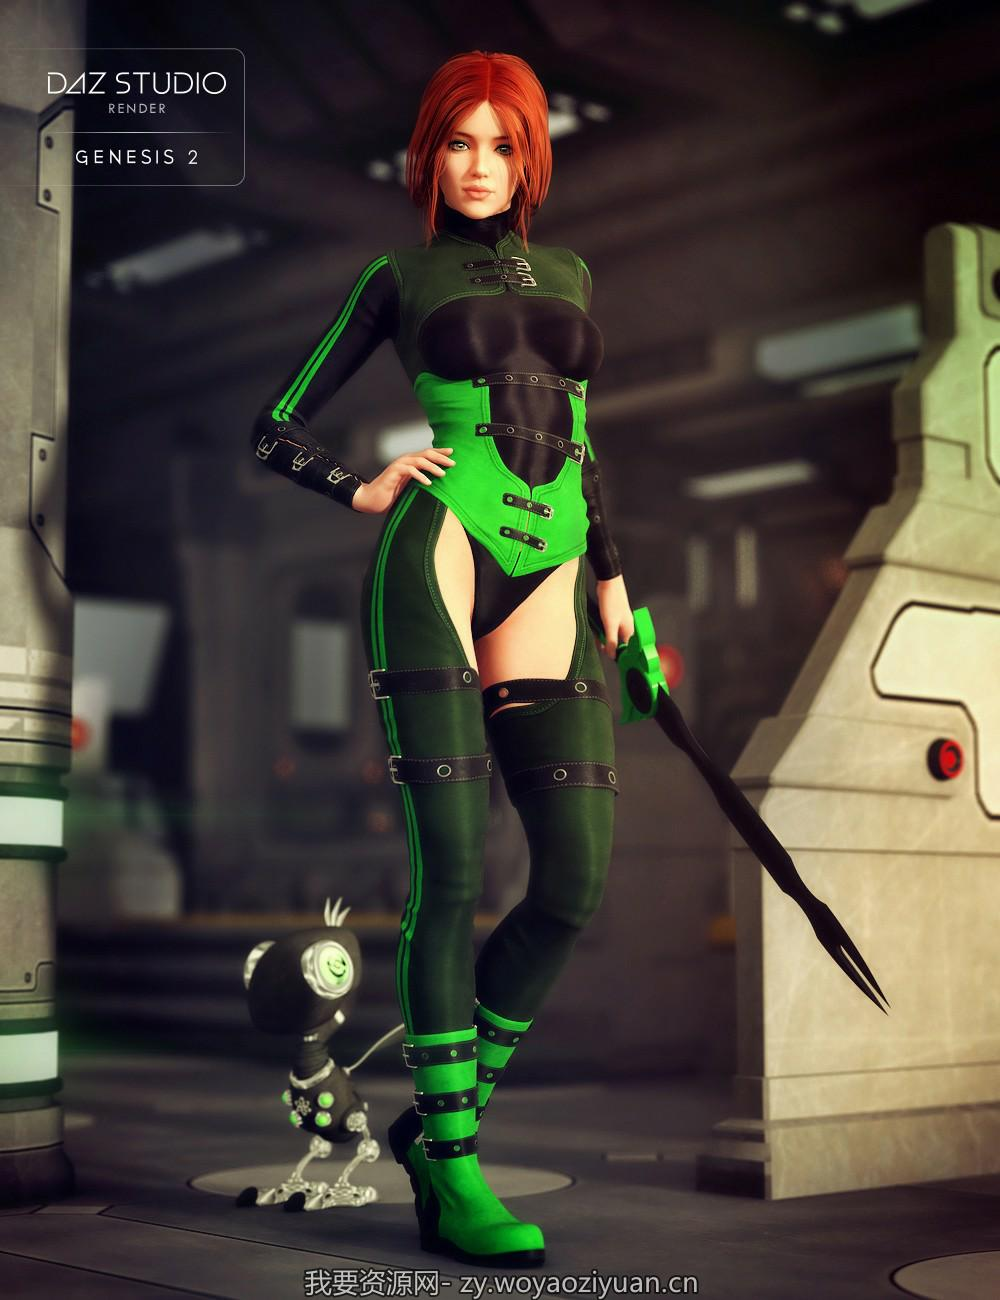 SciFi Enforcer for Genesis 2 Female(s)